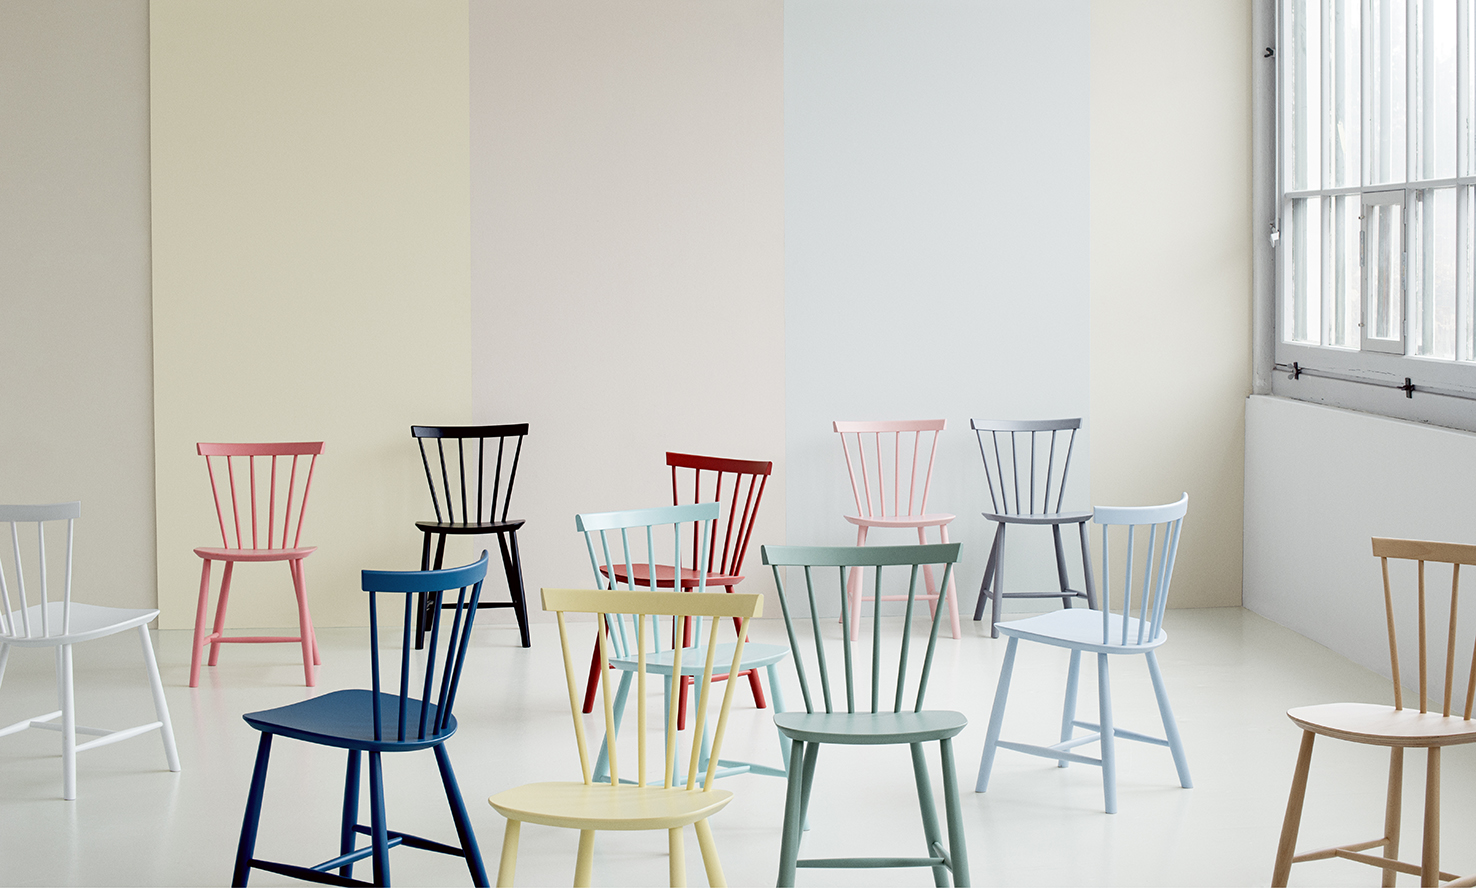 0c1c7bd8ed2 Her åbner Danmarks tredje butik med FDB-møbler - RetailNews